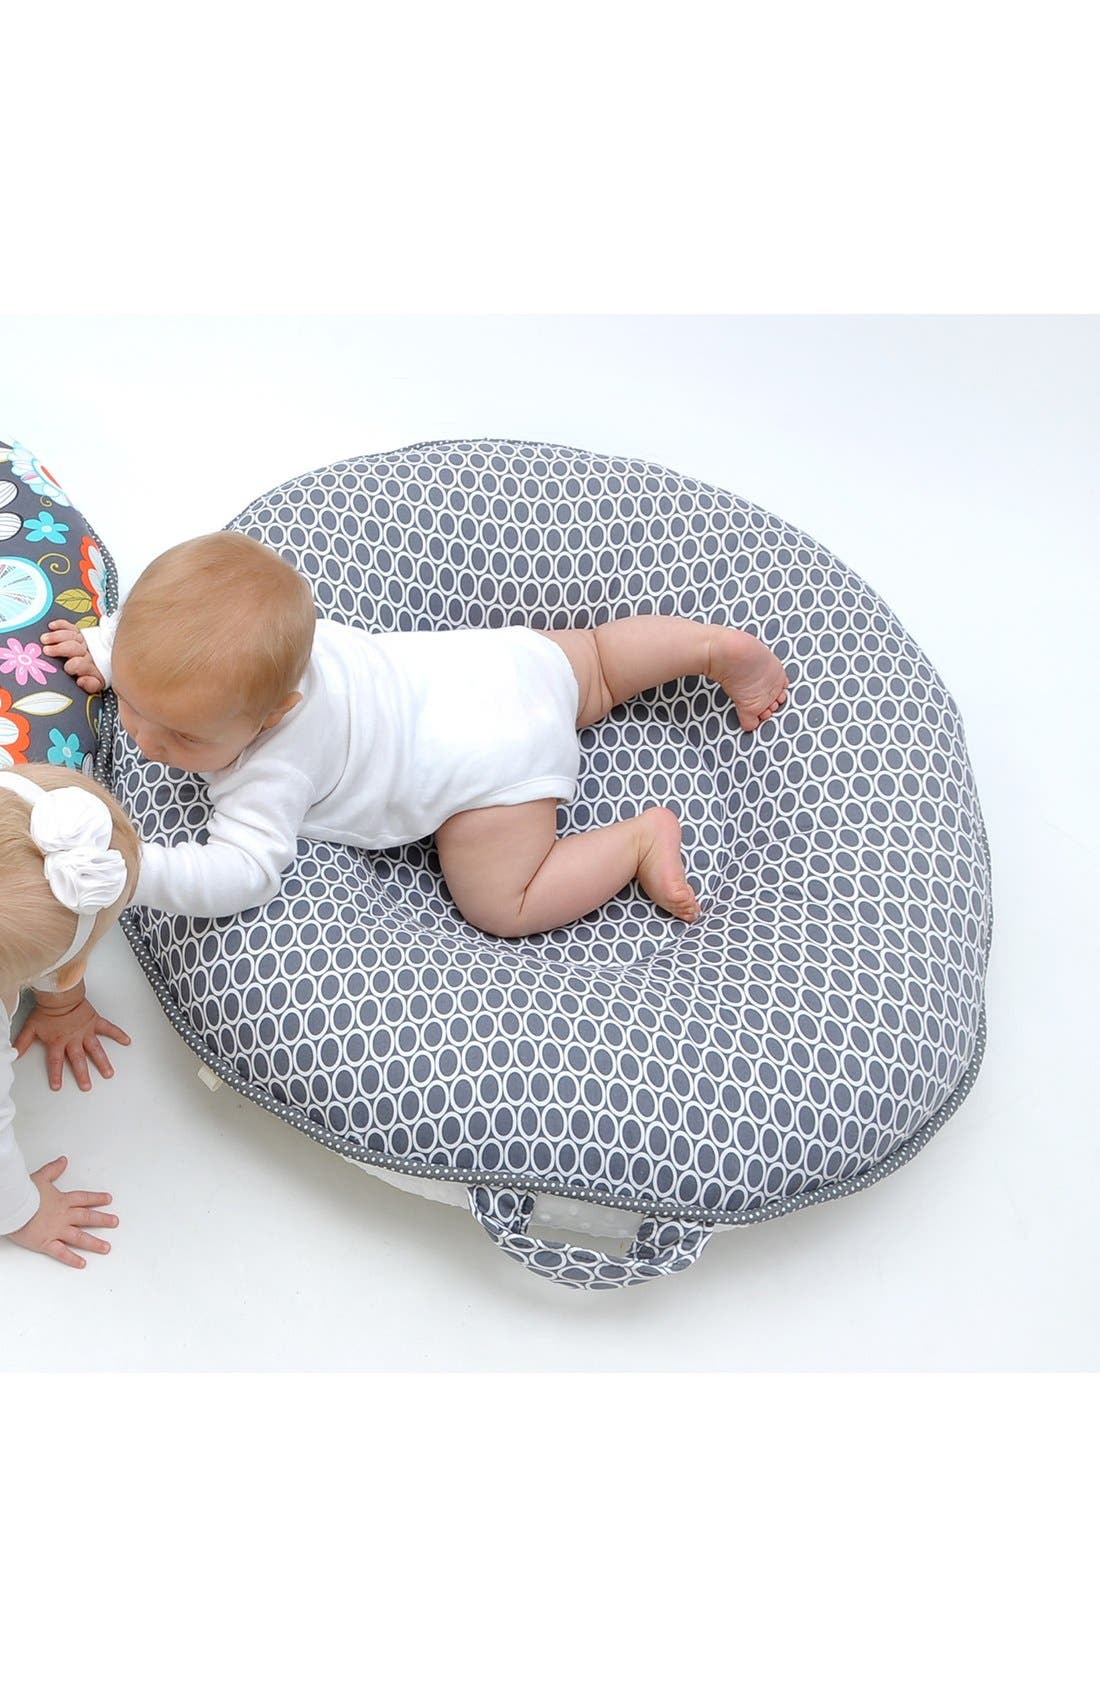 'Majestic' Portable Floor Pillow,                             Alternate thumbnail 3, color,                             020